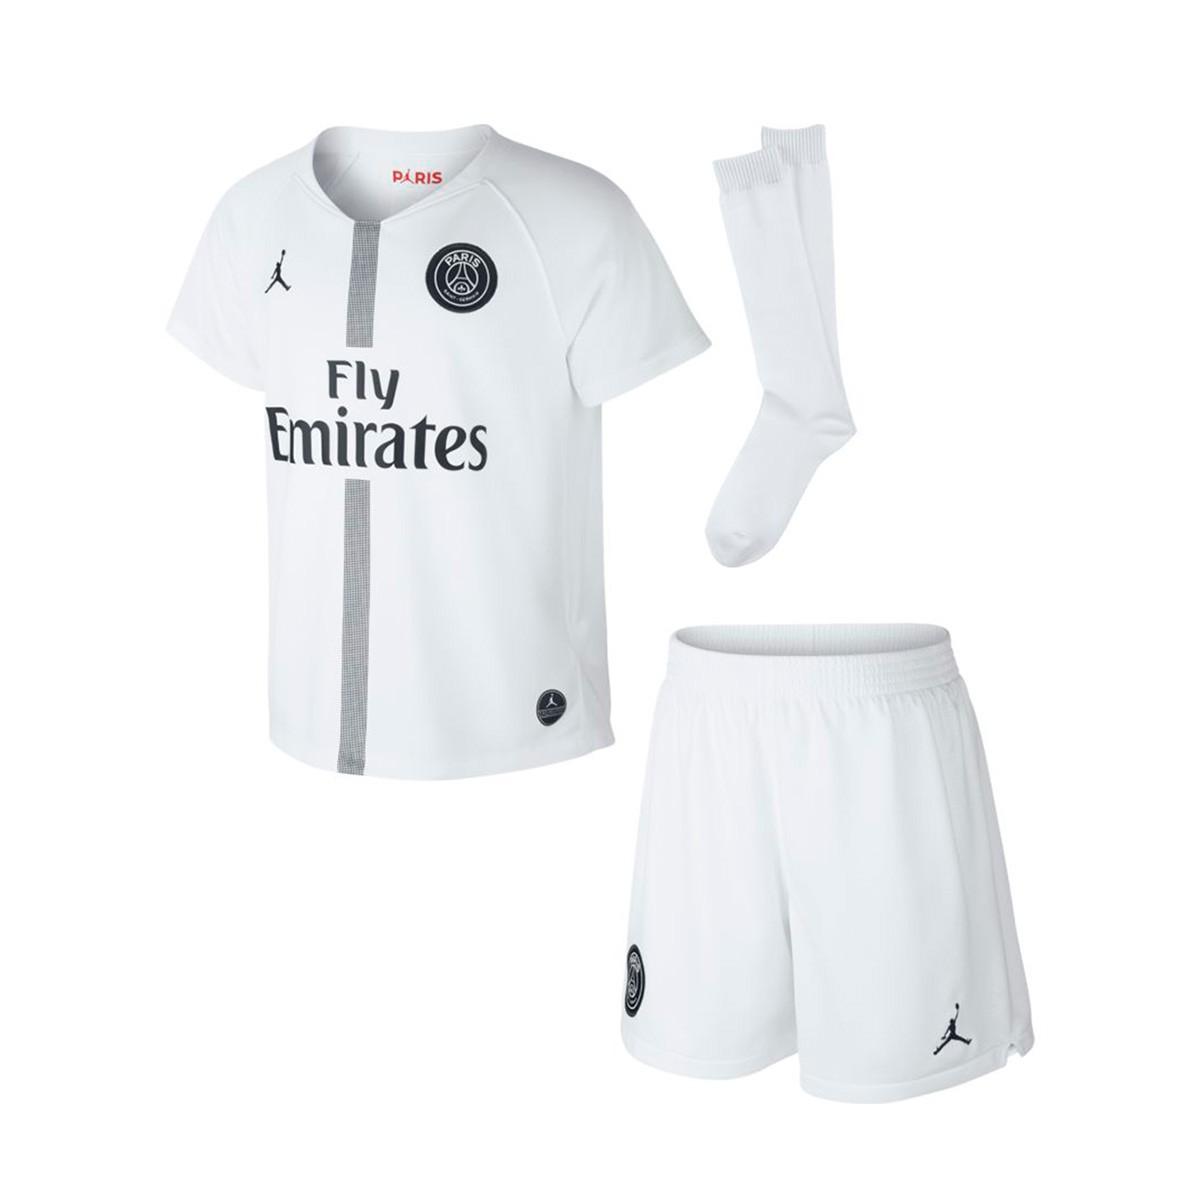 the best attitude 9e17b 03b5f Conjunto Paris Saint-Germain Tercera Equipación 2018-2019 White-Black